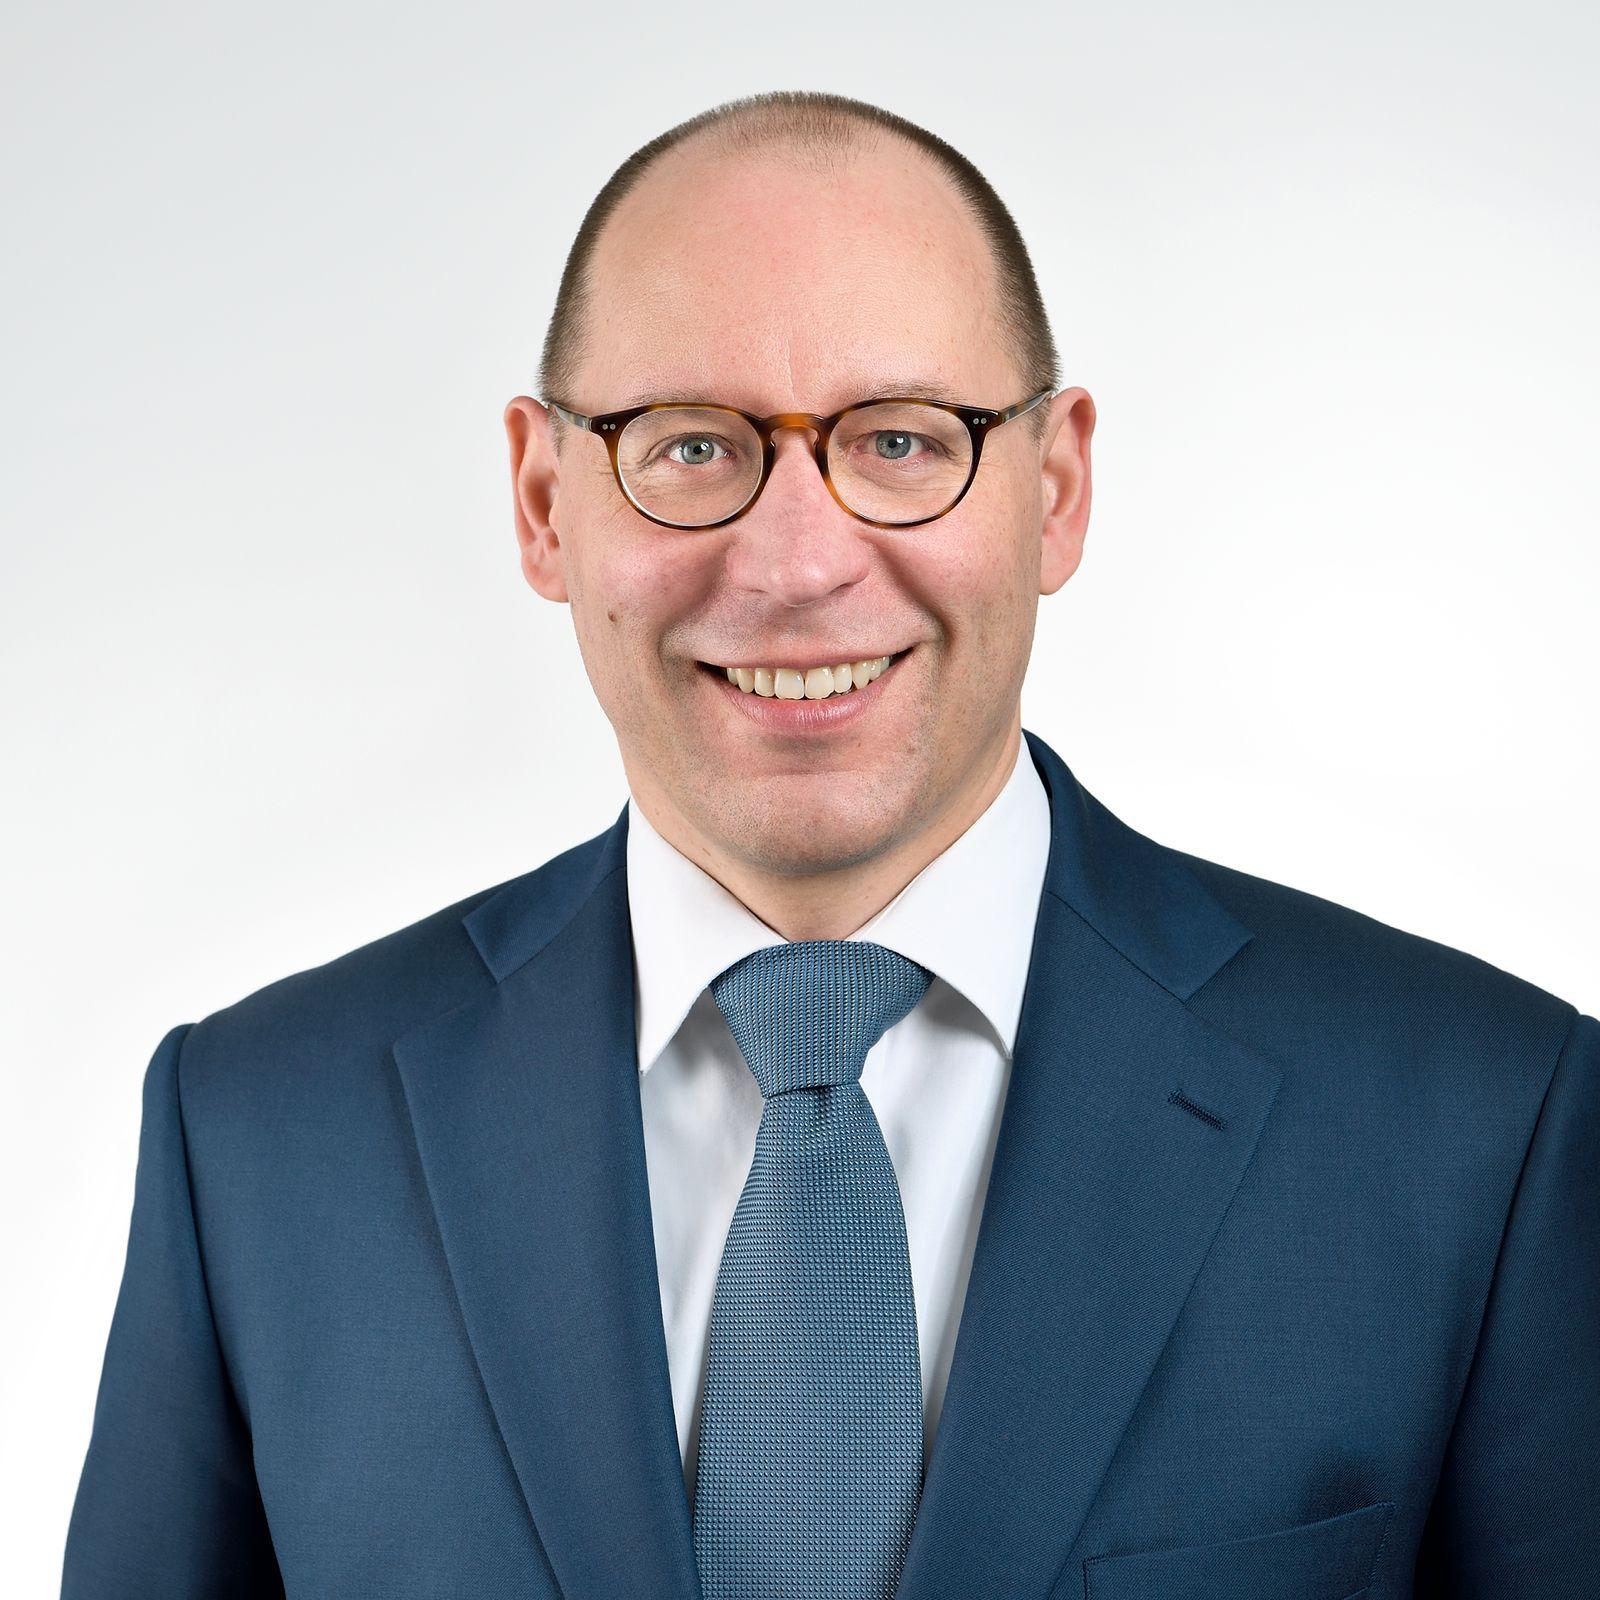 1804_Univ-Prof_Dr_Hans_Michael_Heinig-253q